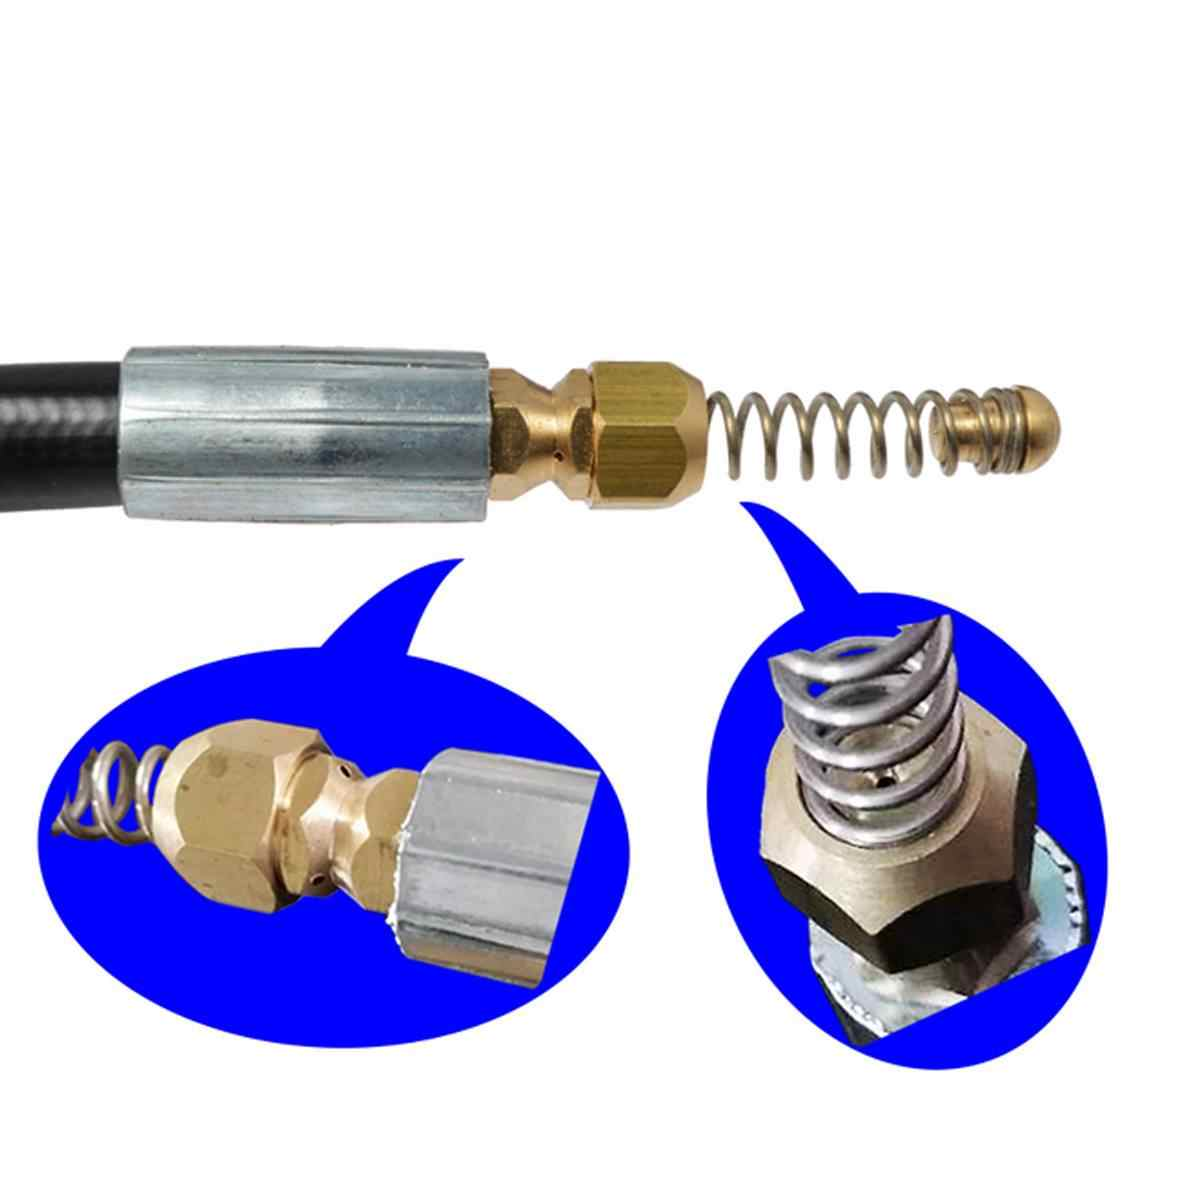 10M Pressure Washer Sewer Drain Cleaning Hose 1/4 Inch Quick Release Drain Sewer Cleaning Hose for Karcher K2-K7 Water Guns